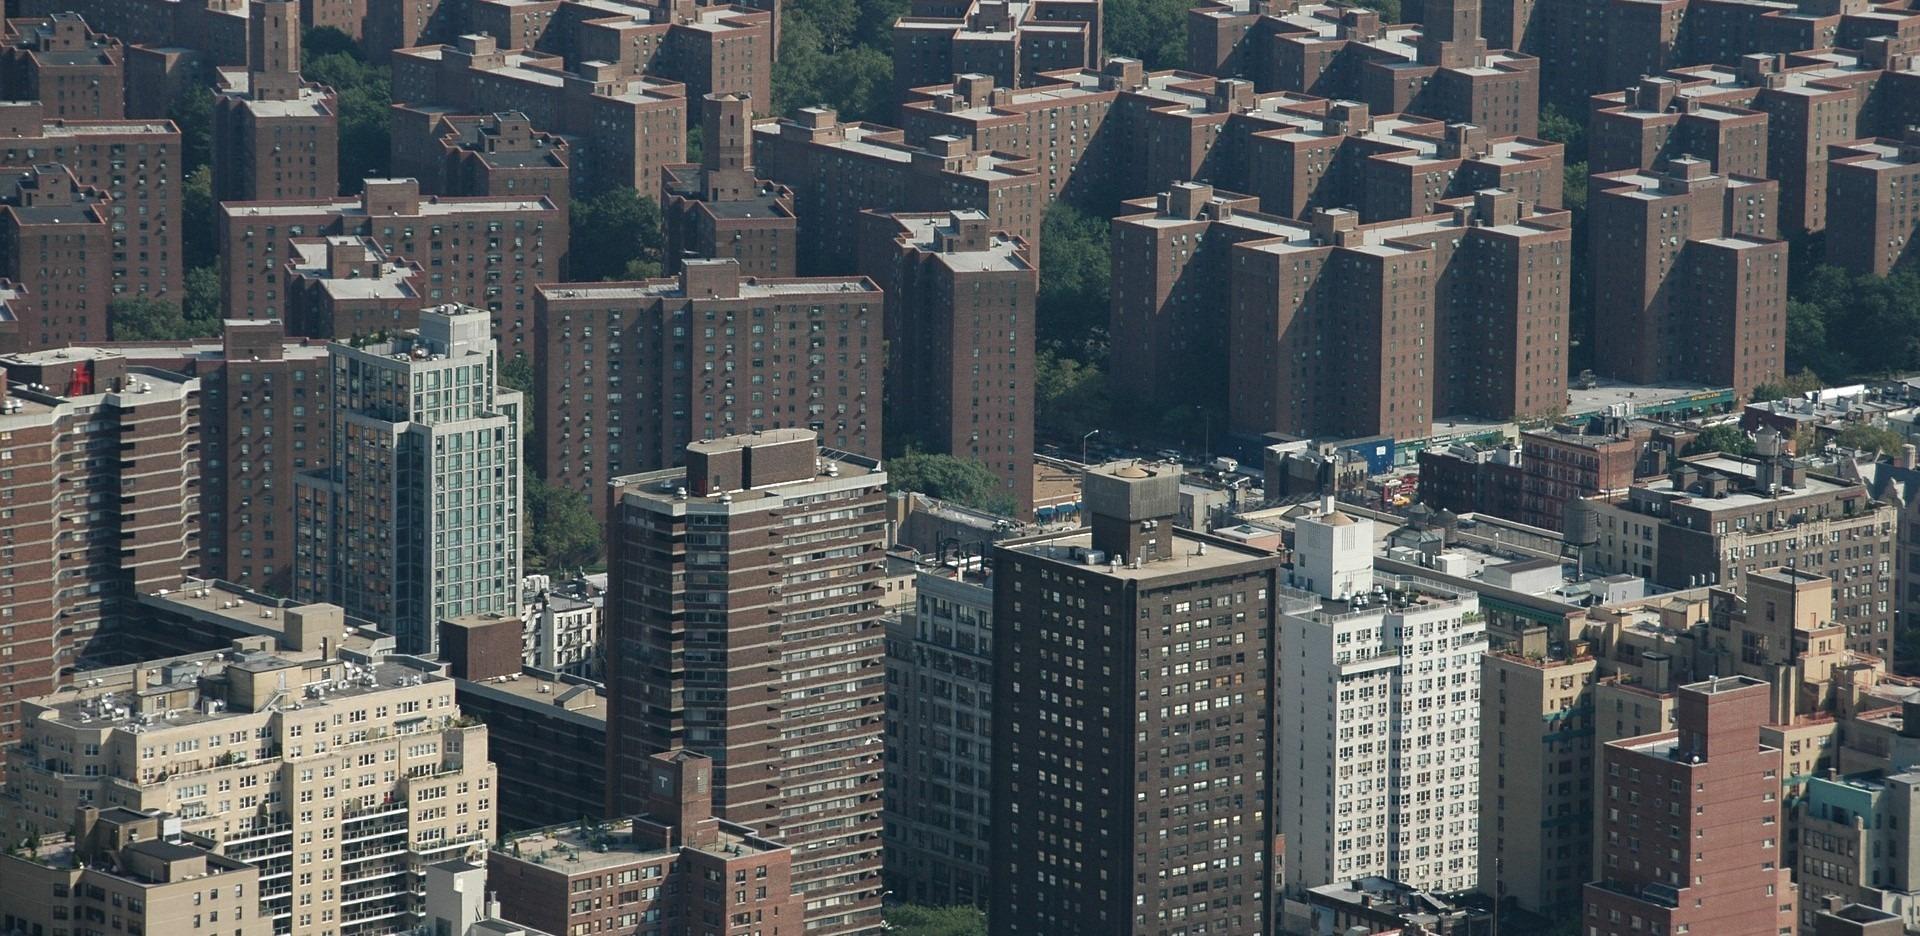 View of Suburb Skyline in Bronx, New York - GoodwillCarDonation.org